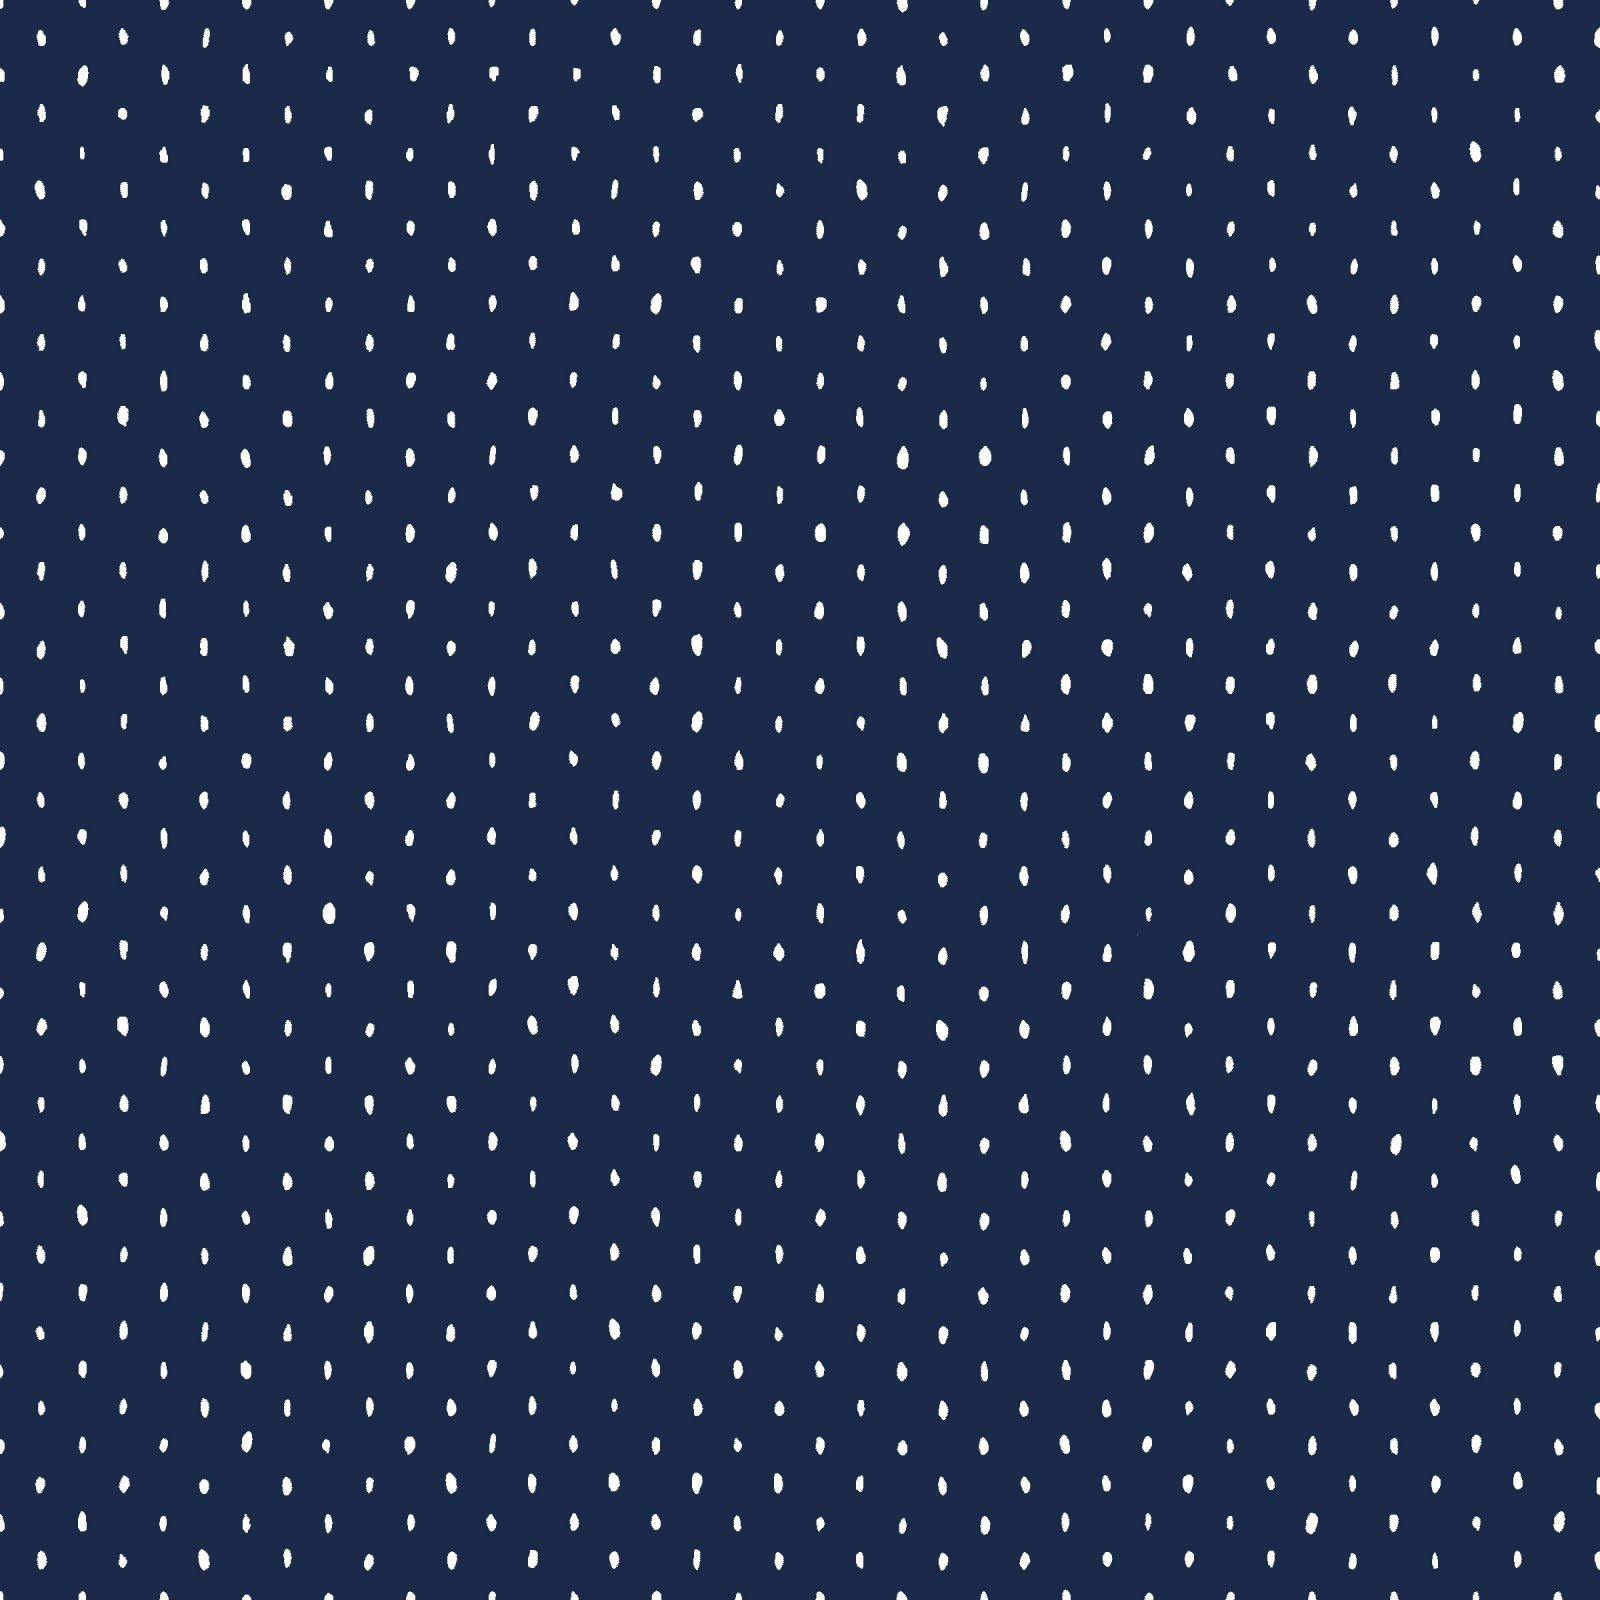 CS101-SA8_stitch_and_repeat_sailor